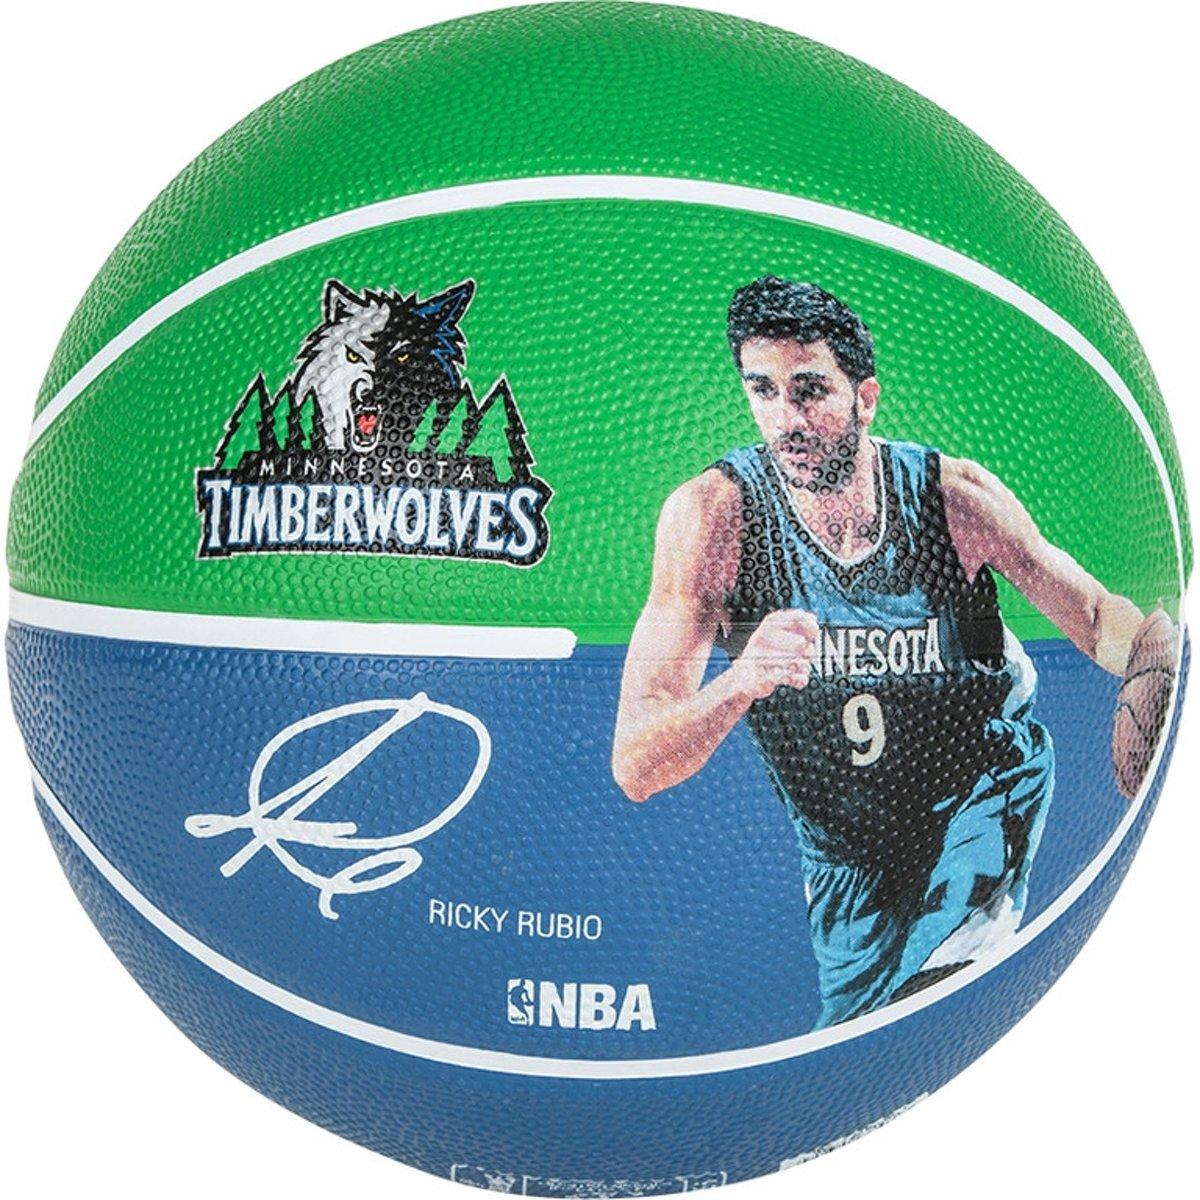 Spalding Basketbal NBA Ricky Rubio Groen/Navy kopen